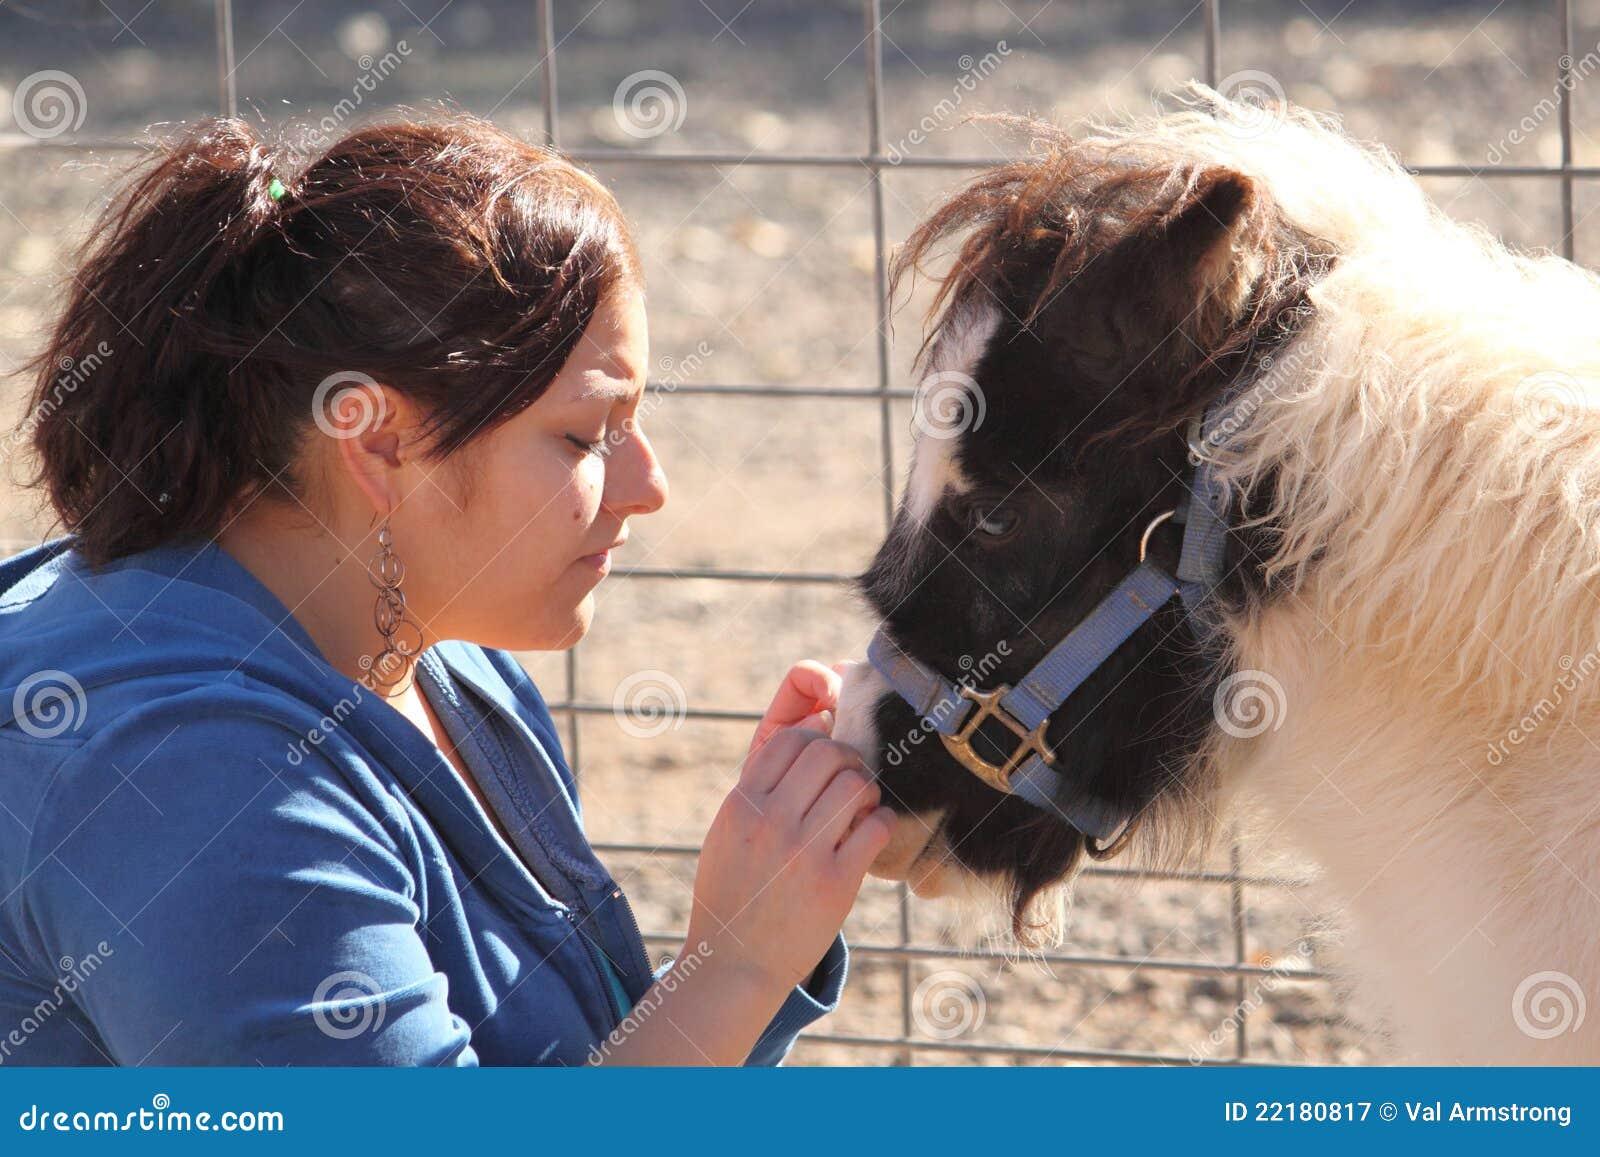 Frau, die ein Minipferd Petting ist